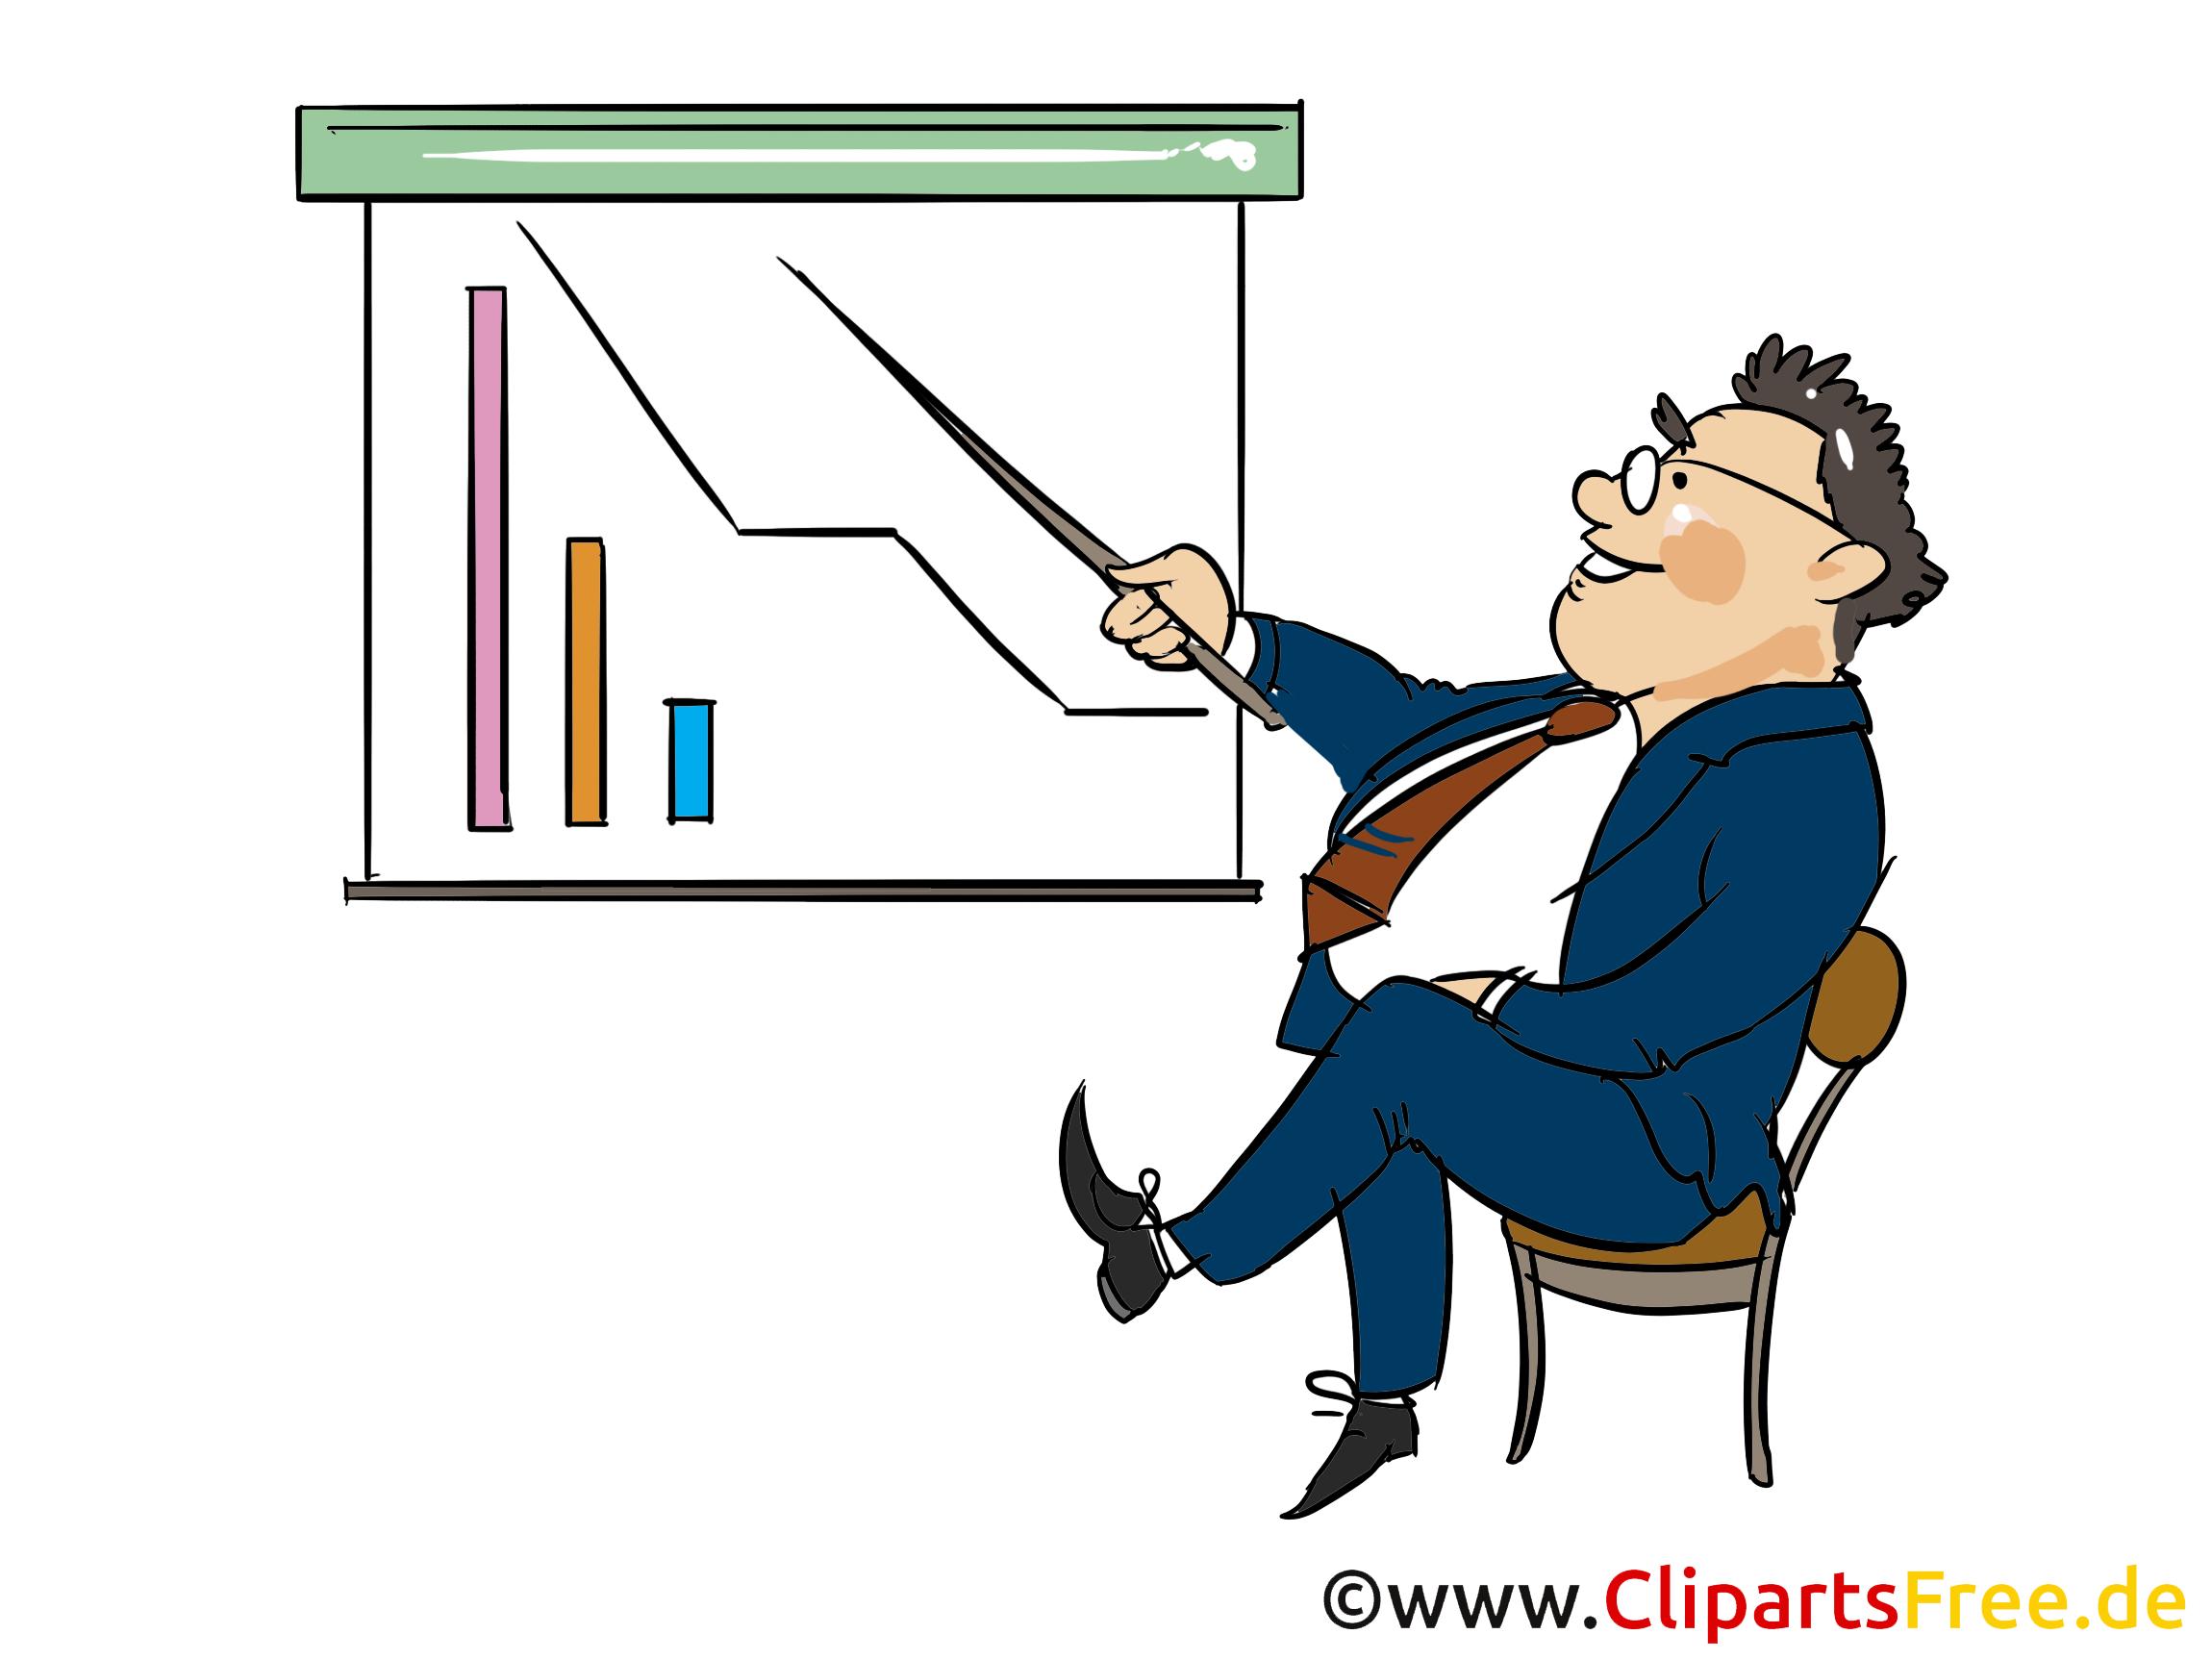 Investieren Bild, Clipart, Grafik, Cartoon, Illustration